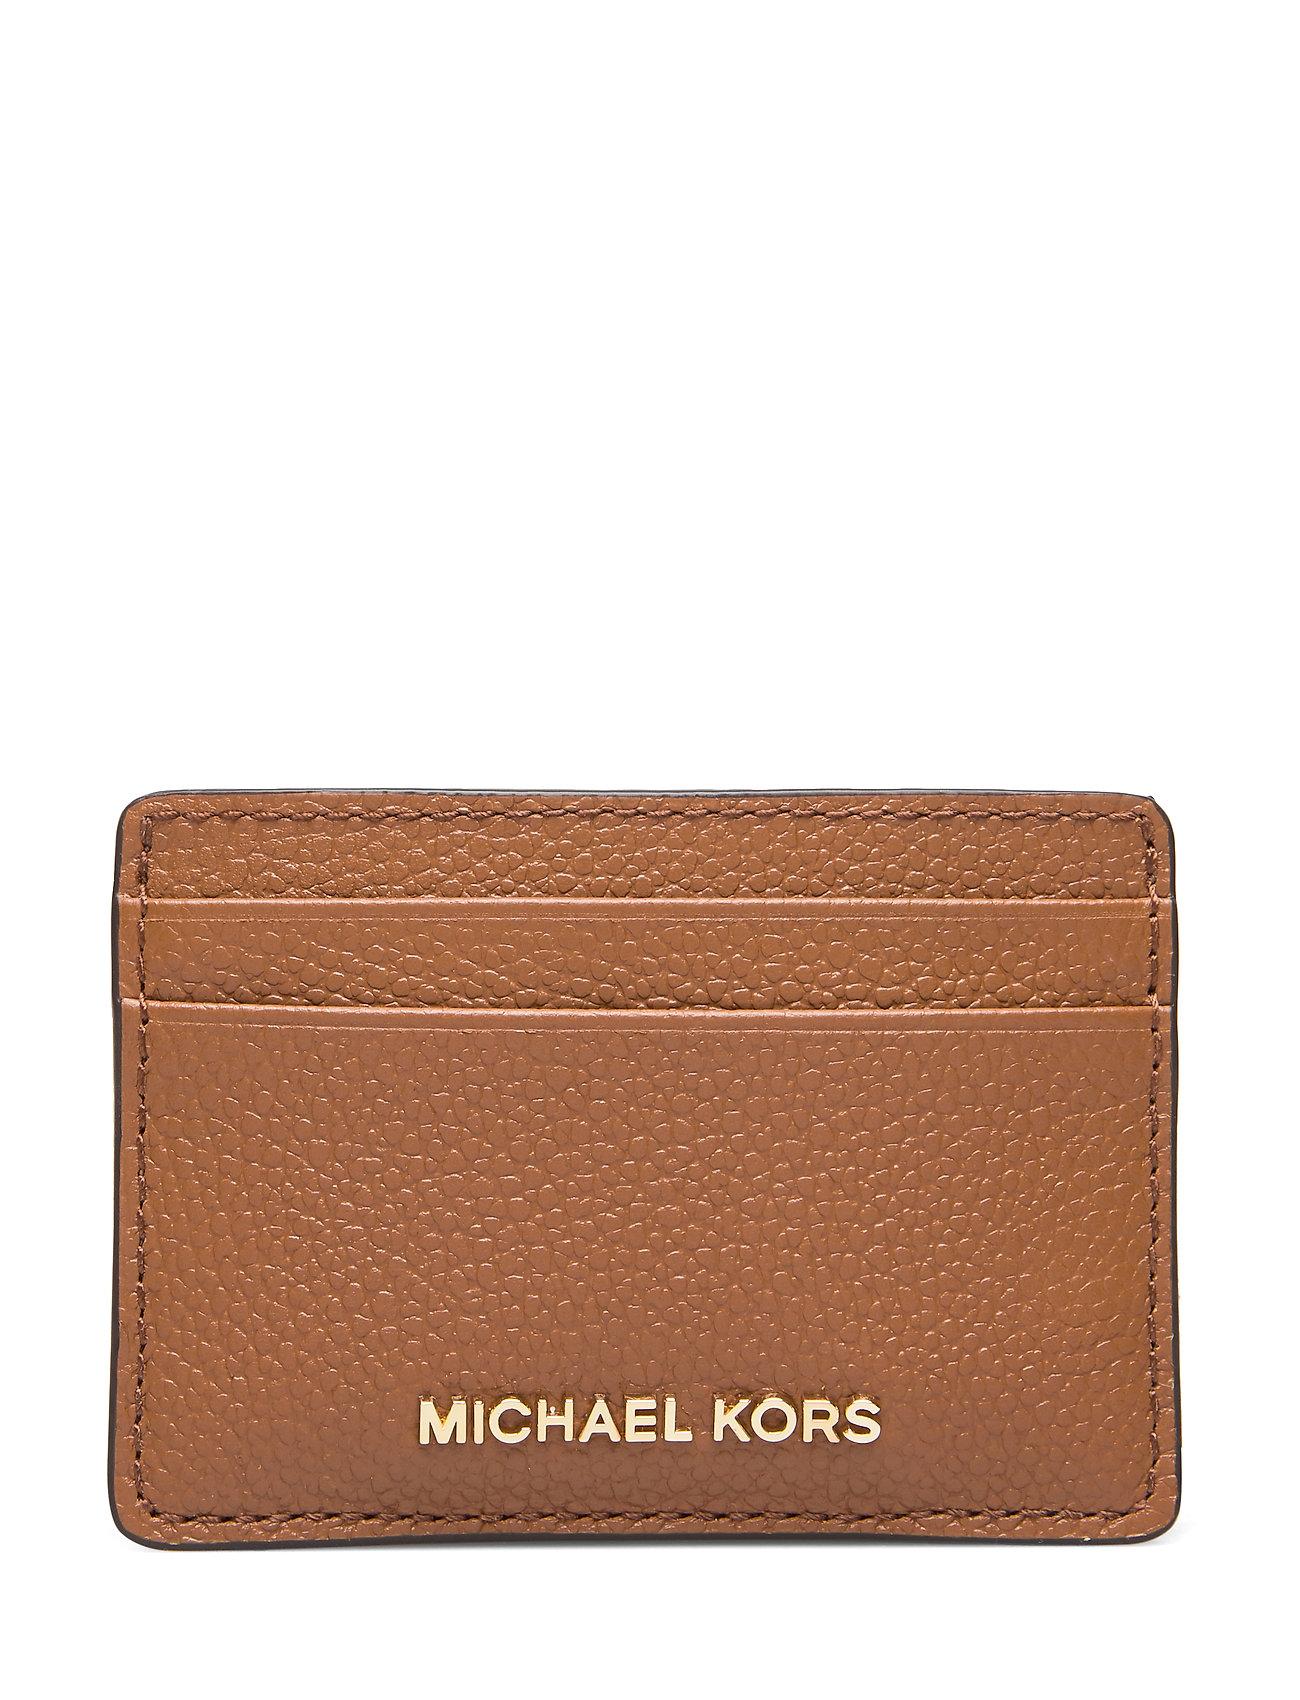 Michael Kors Bags CARD HOLDER - LUGGAGE